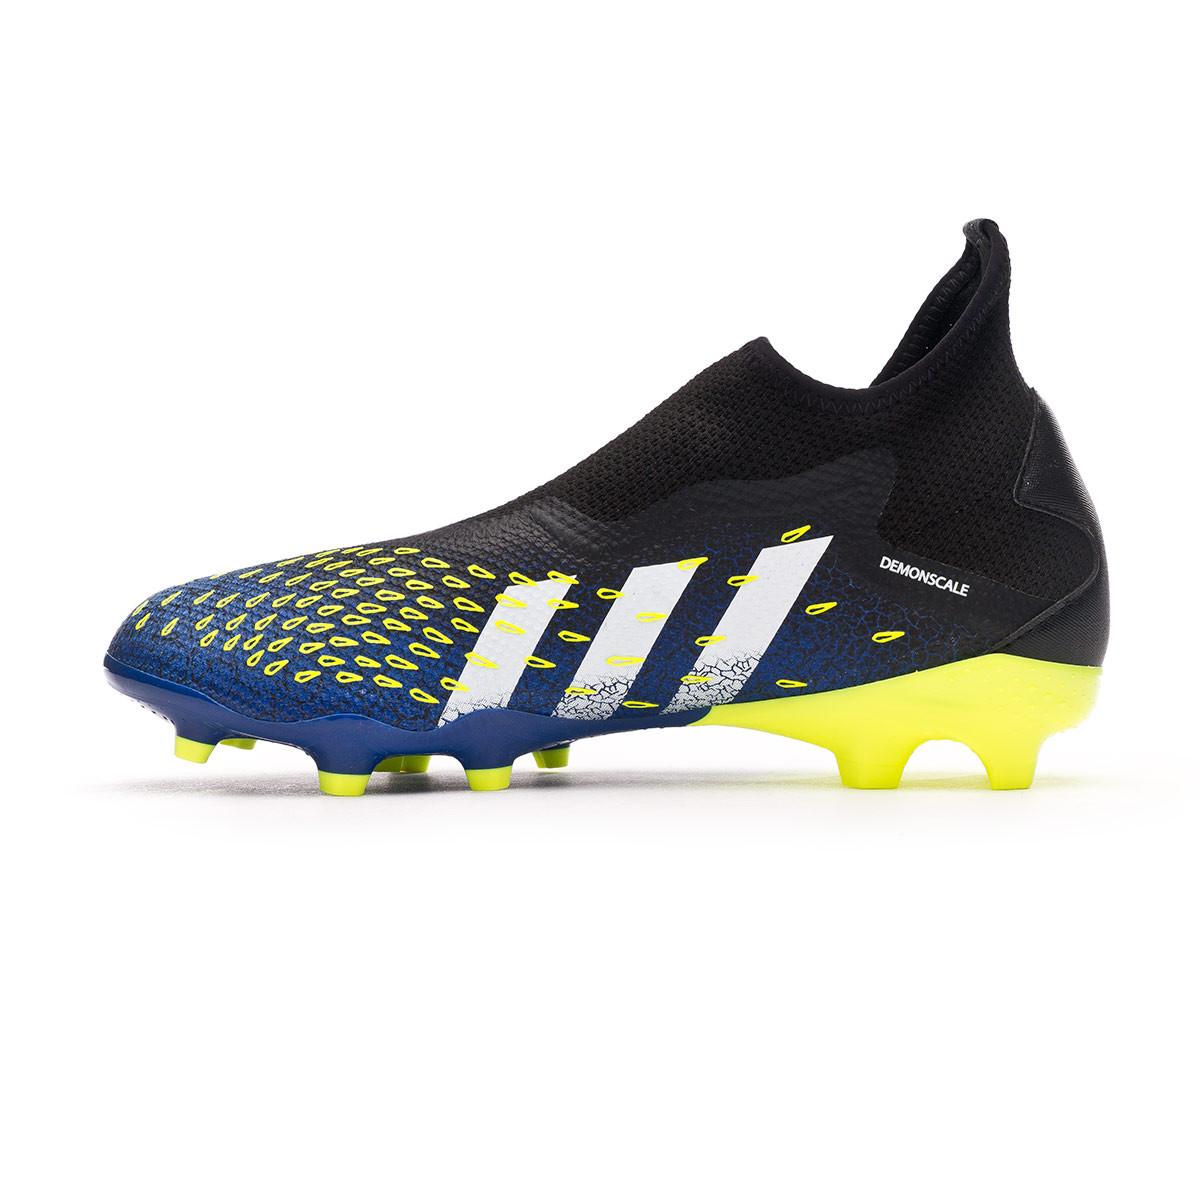 adidas Predator Freak .3 LL FG Football Boots